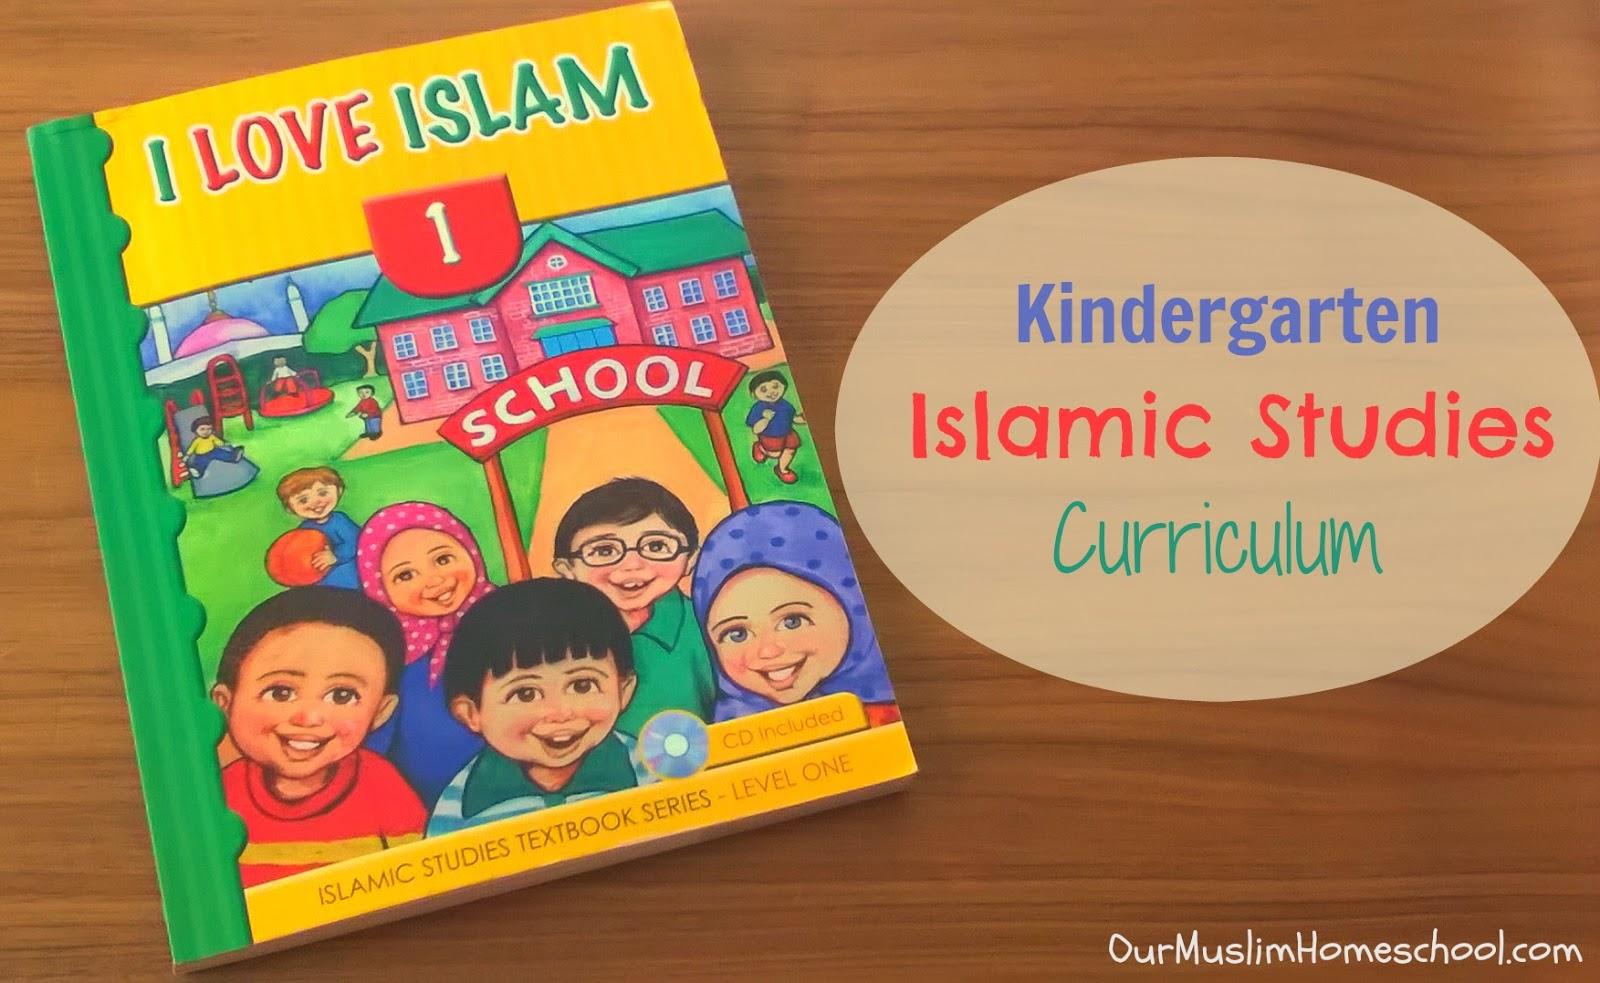 medium resolution of Kindergarten Islamic Studies Curriculum - Muslim Homeschooling Resources